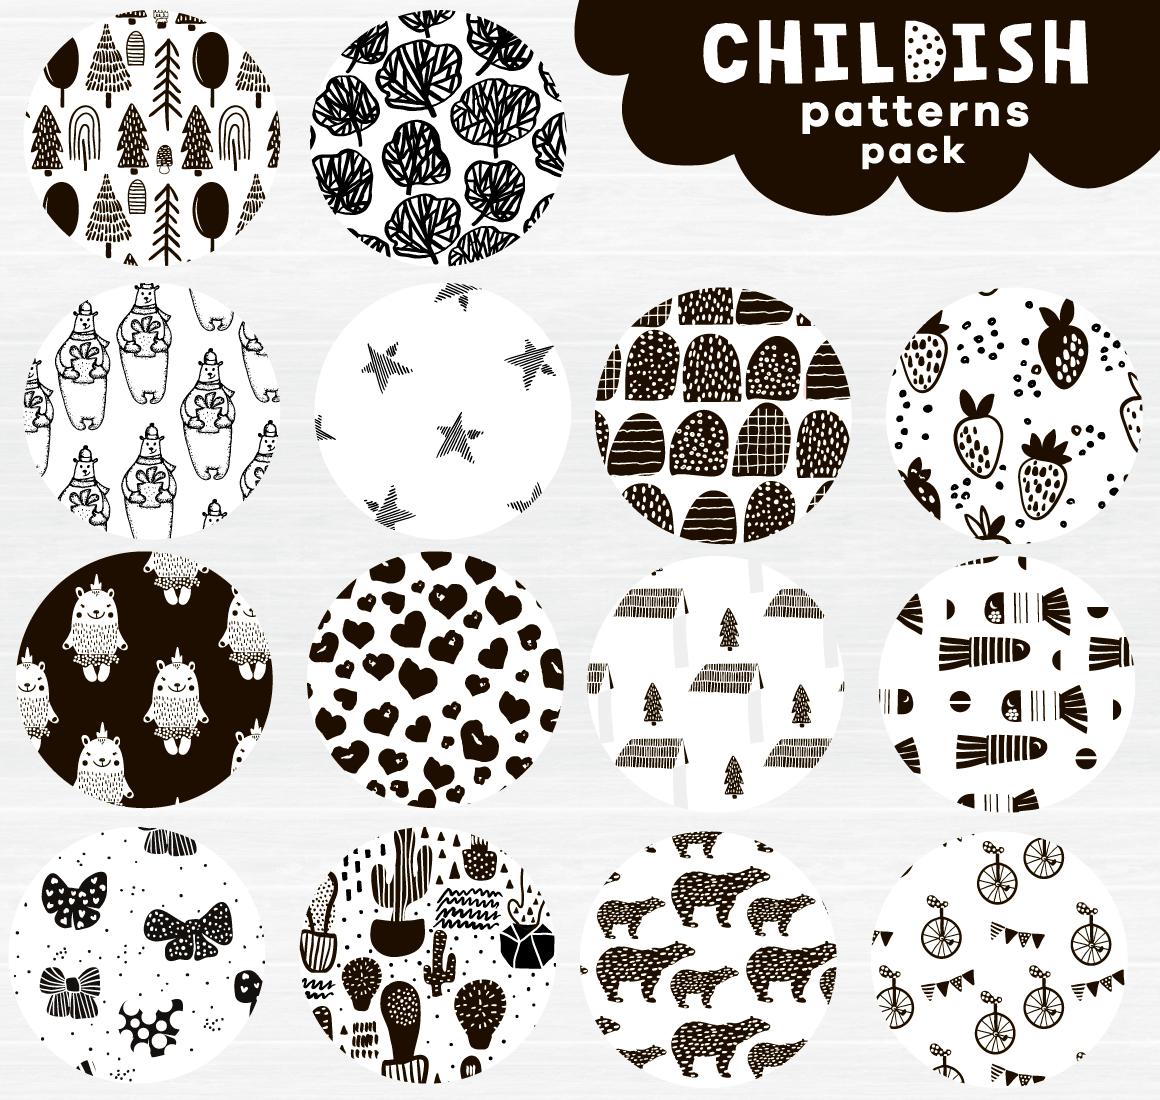 Childish patterns pack example image 2